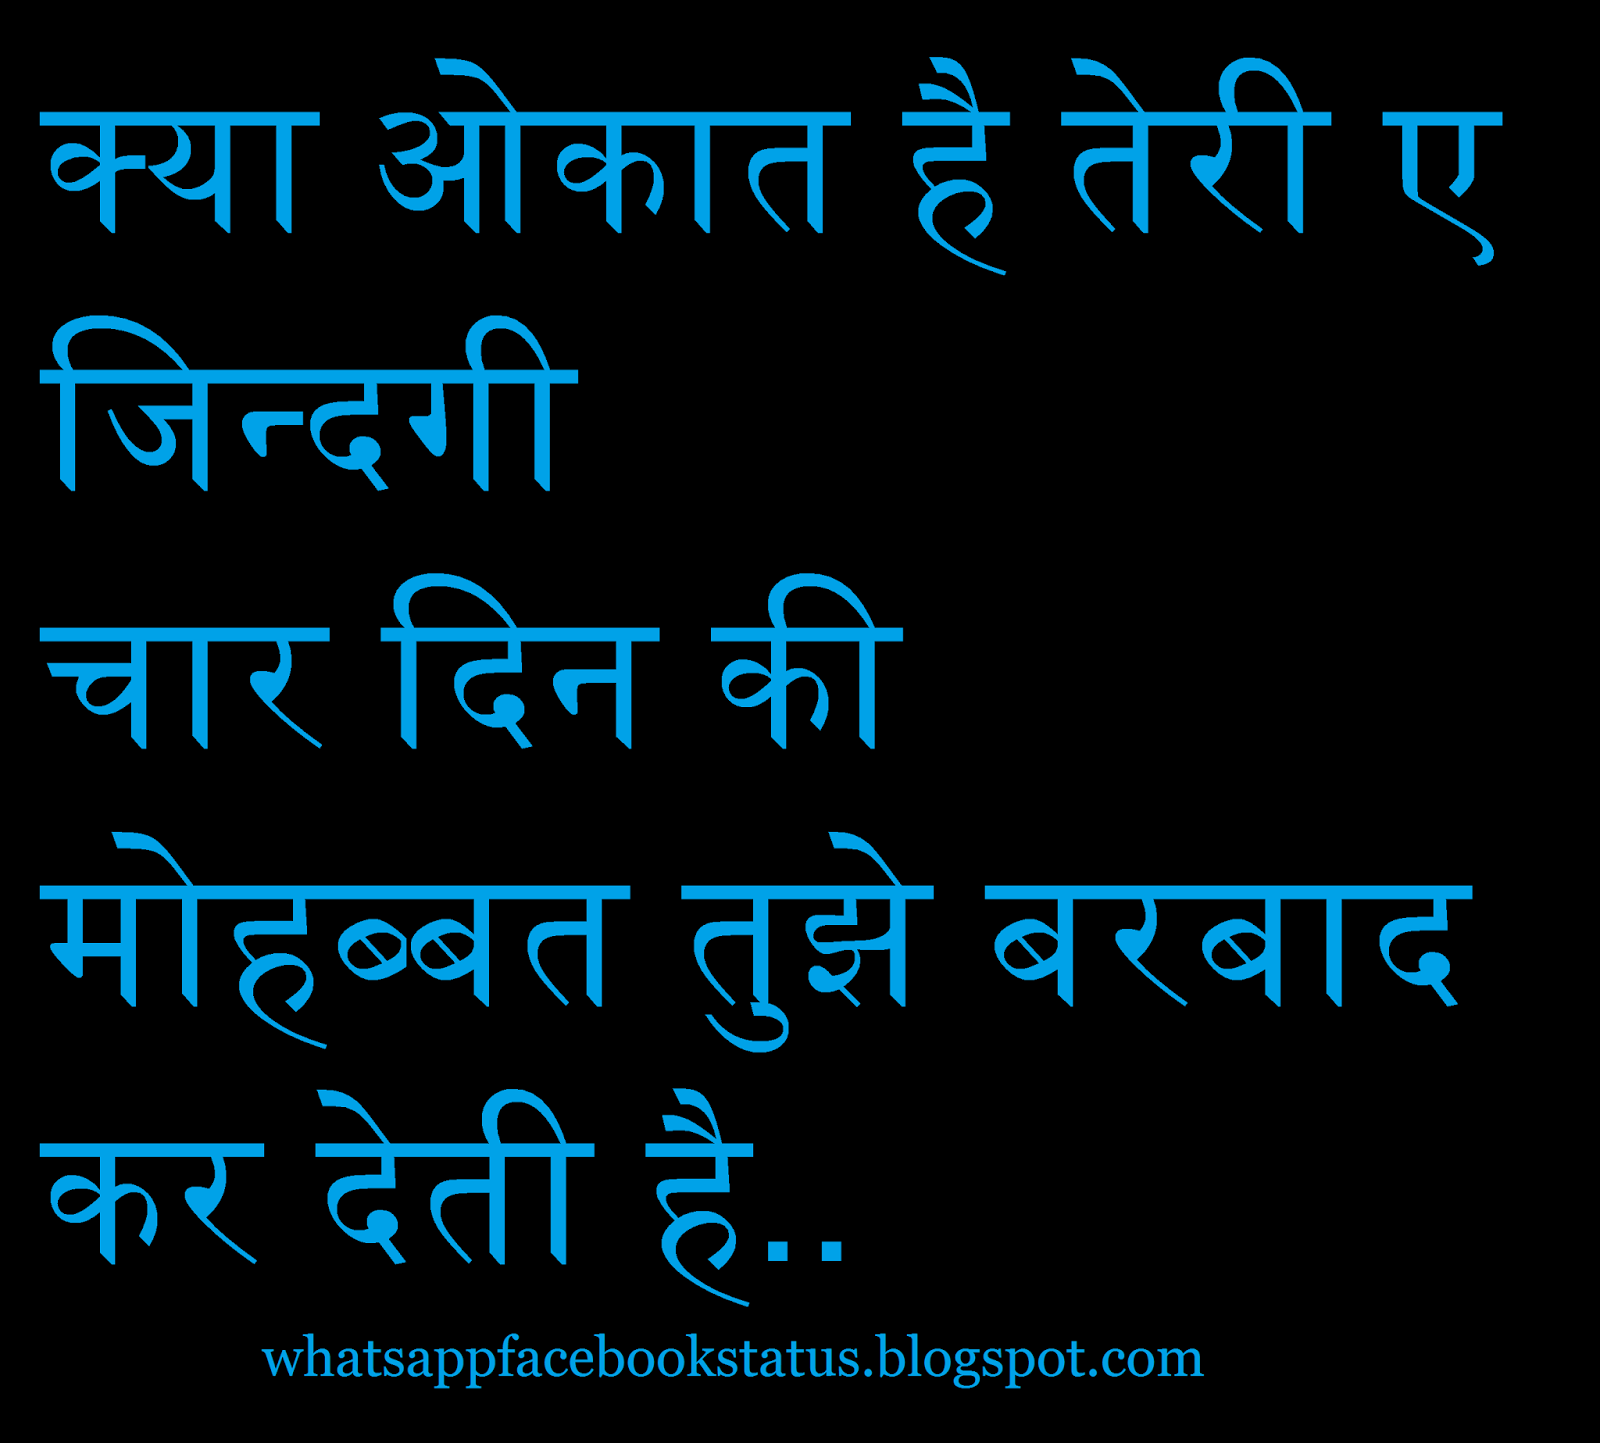 Aukat Zindagi Barbaad Hindi Whatsapp Facebook Status